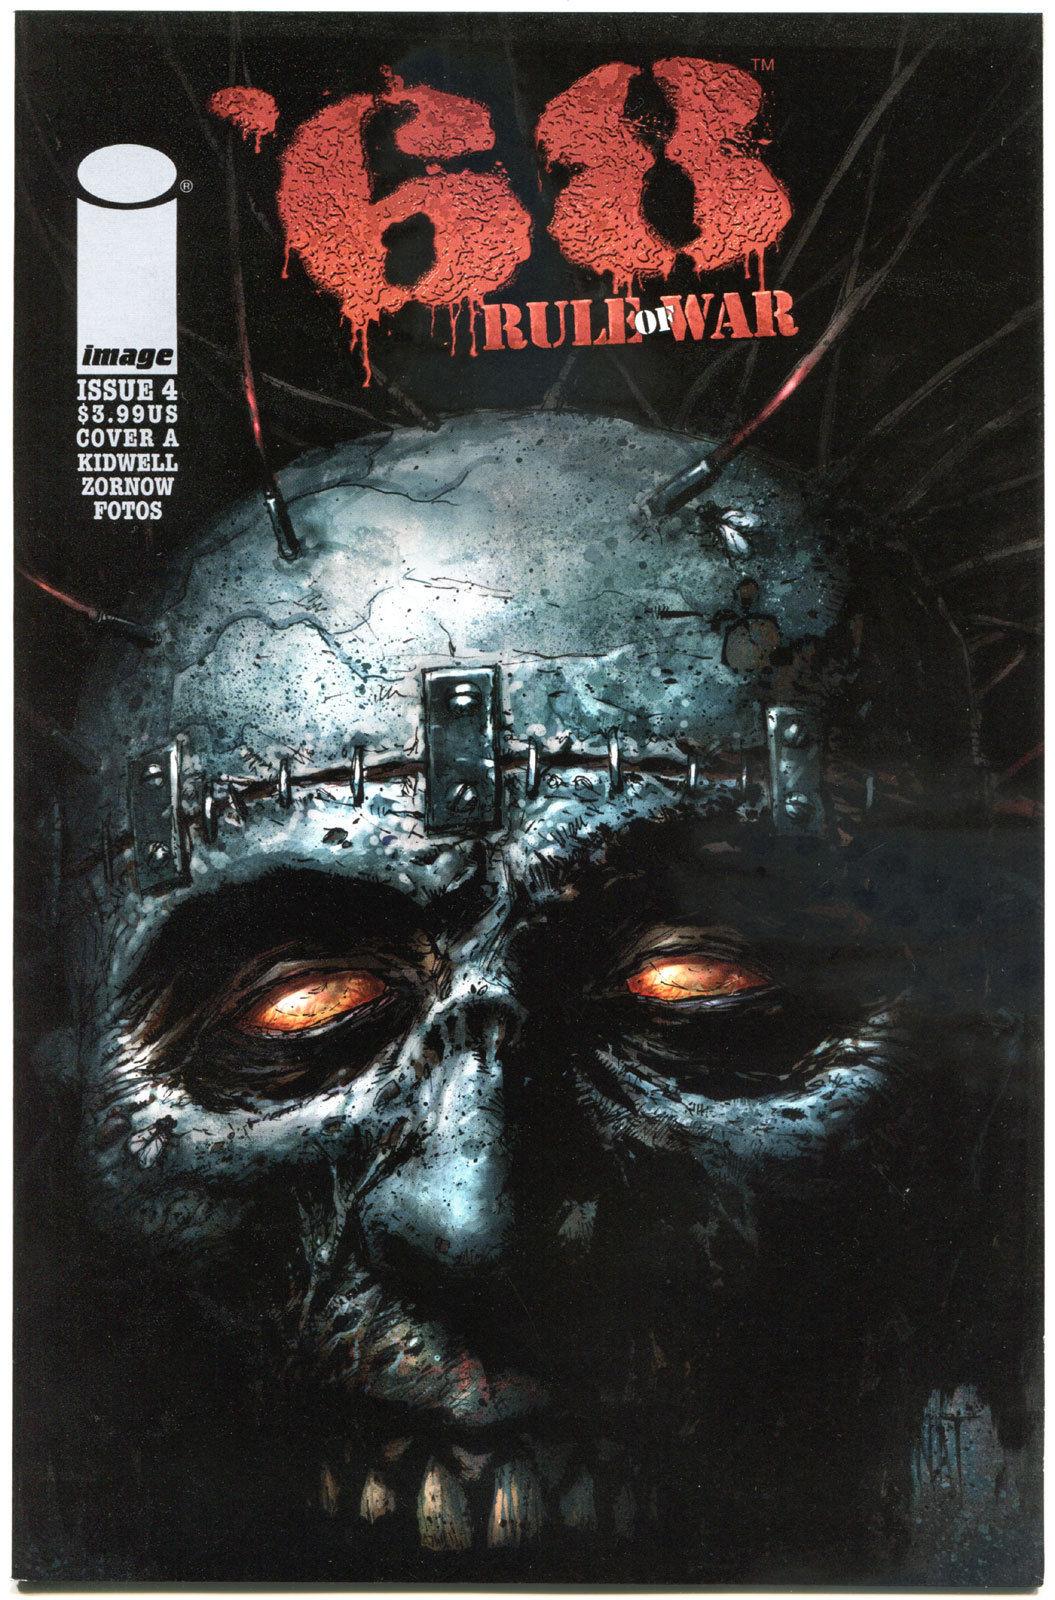 '68 RULE of WAR #4 A, VF+,1st Print, Zombie, Walking Dead, 2014, more in store